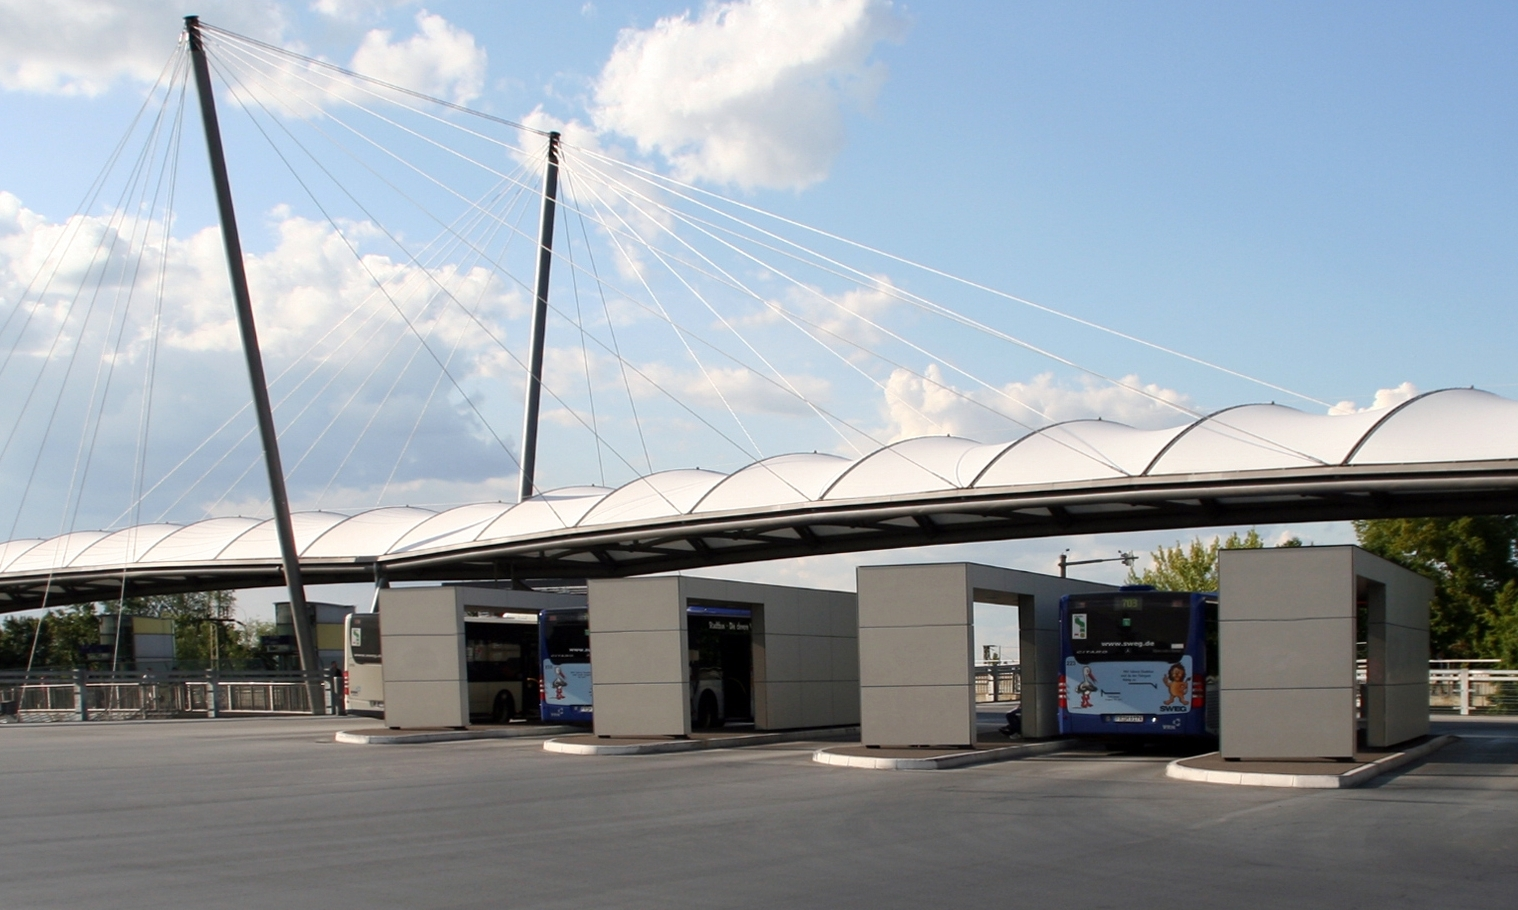 Busbahnhof Walldorf-Wiesloch